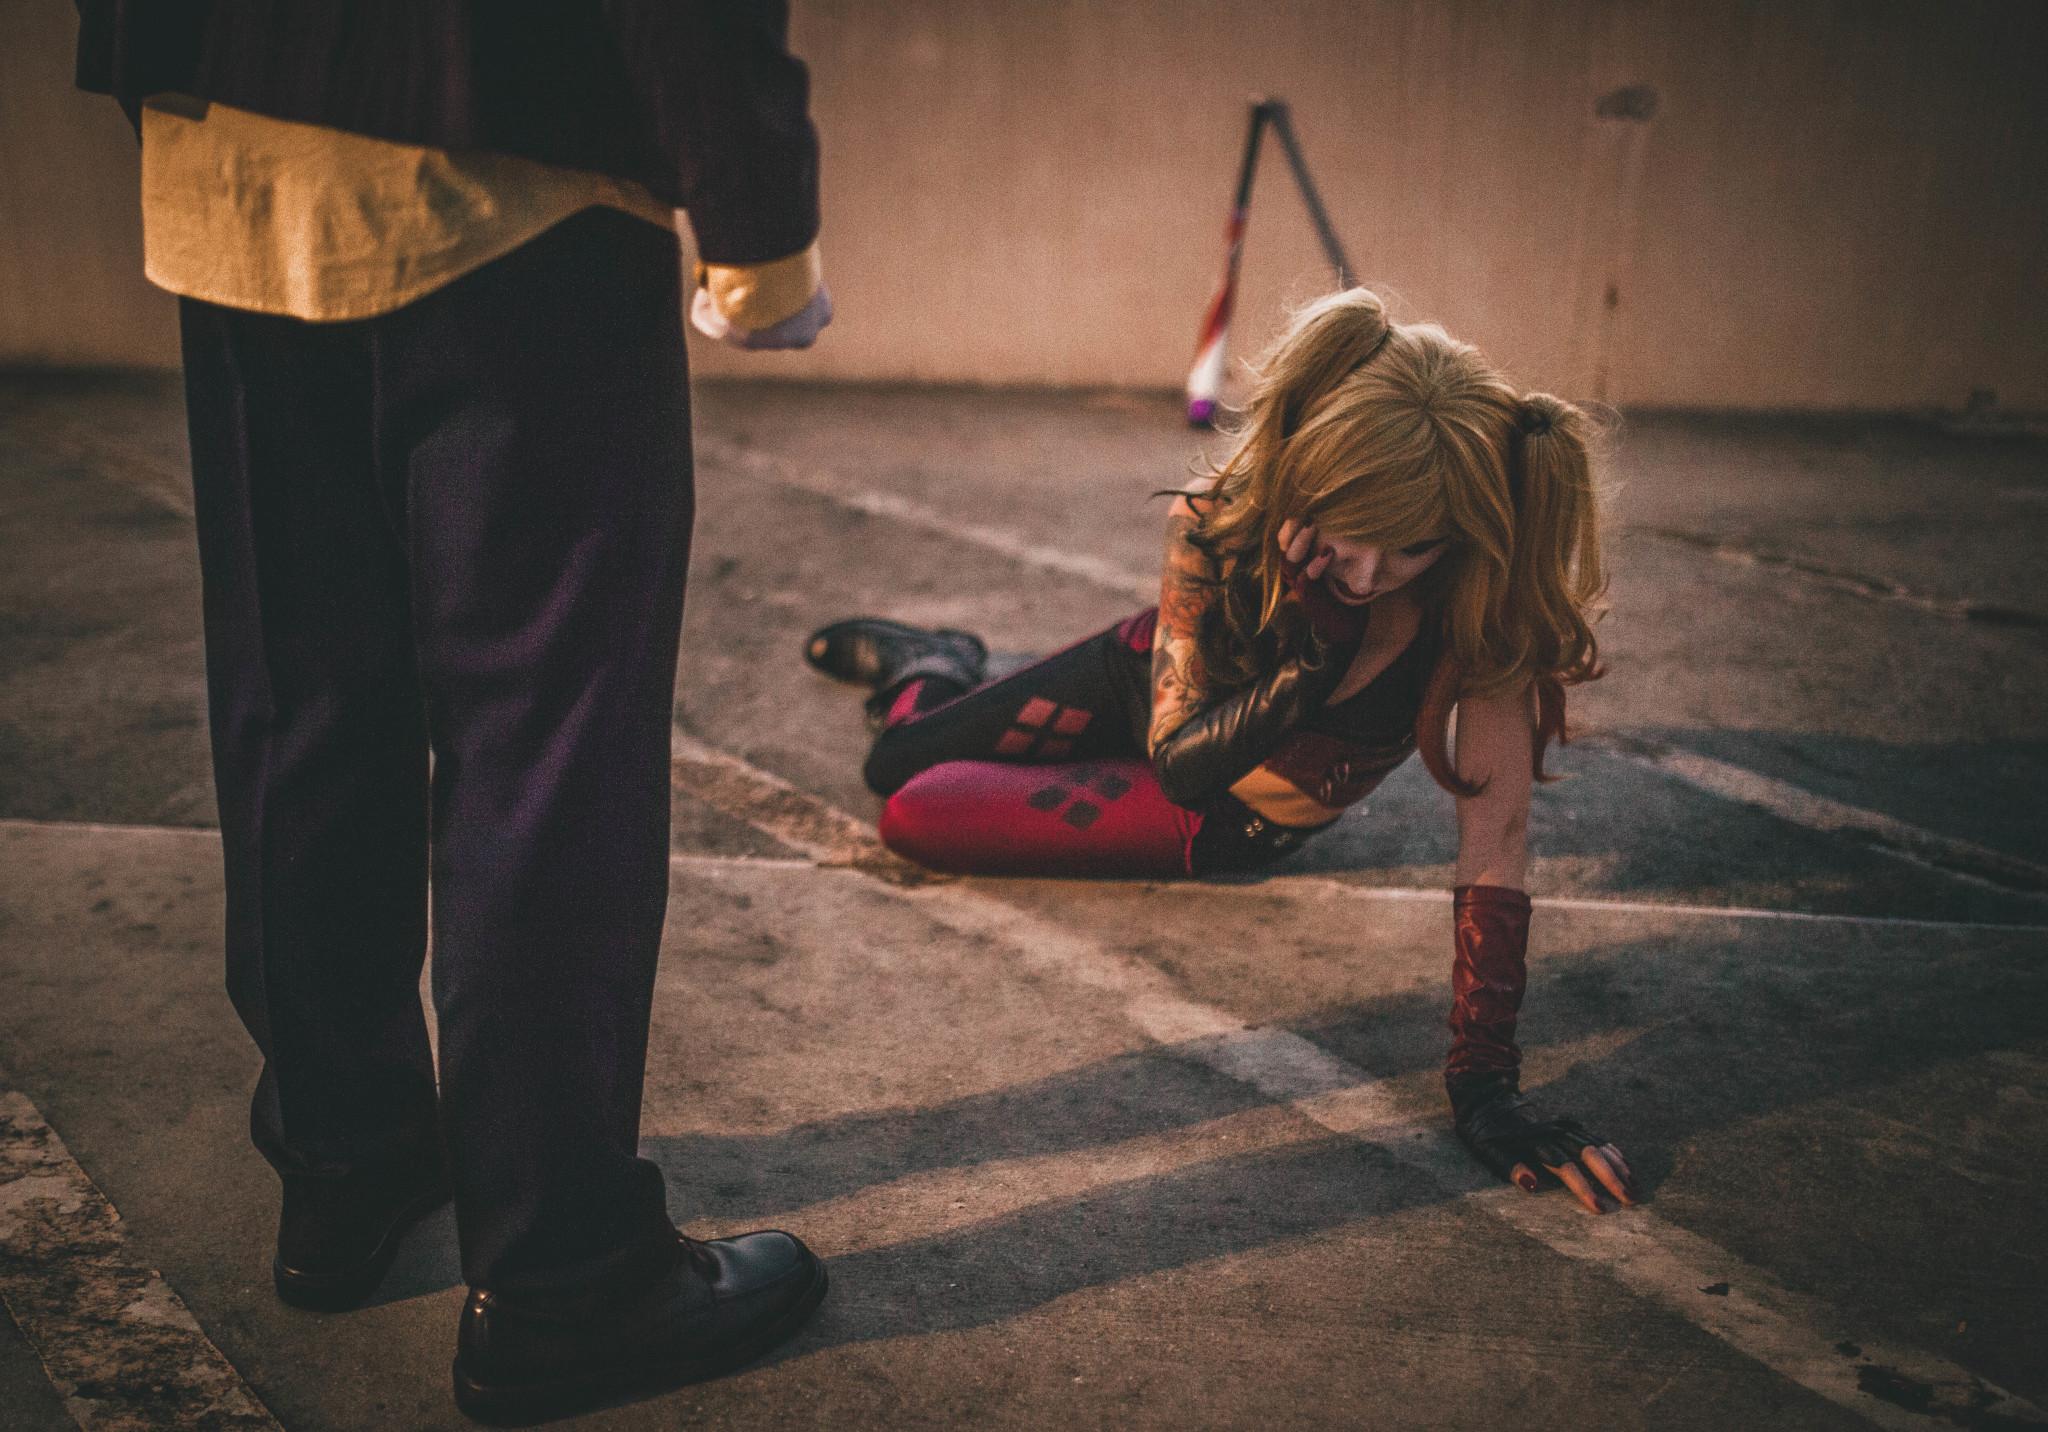 joker and harley shoot real relationship violence lauren rita photography